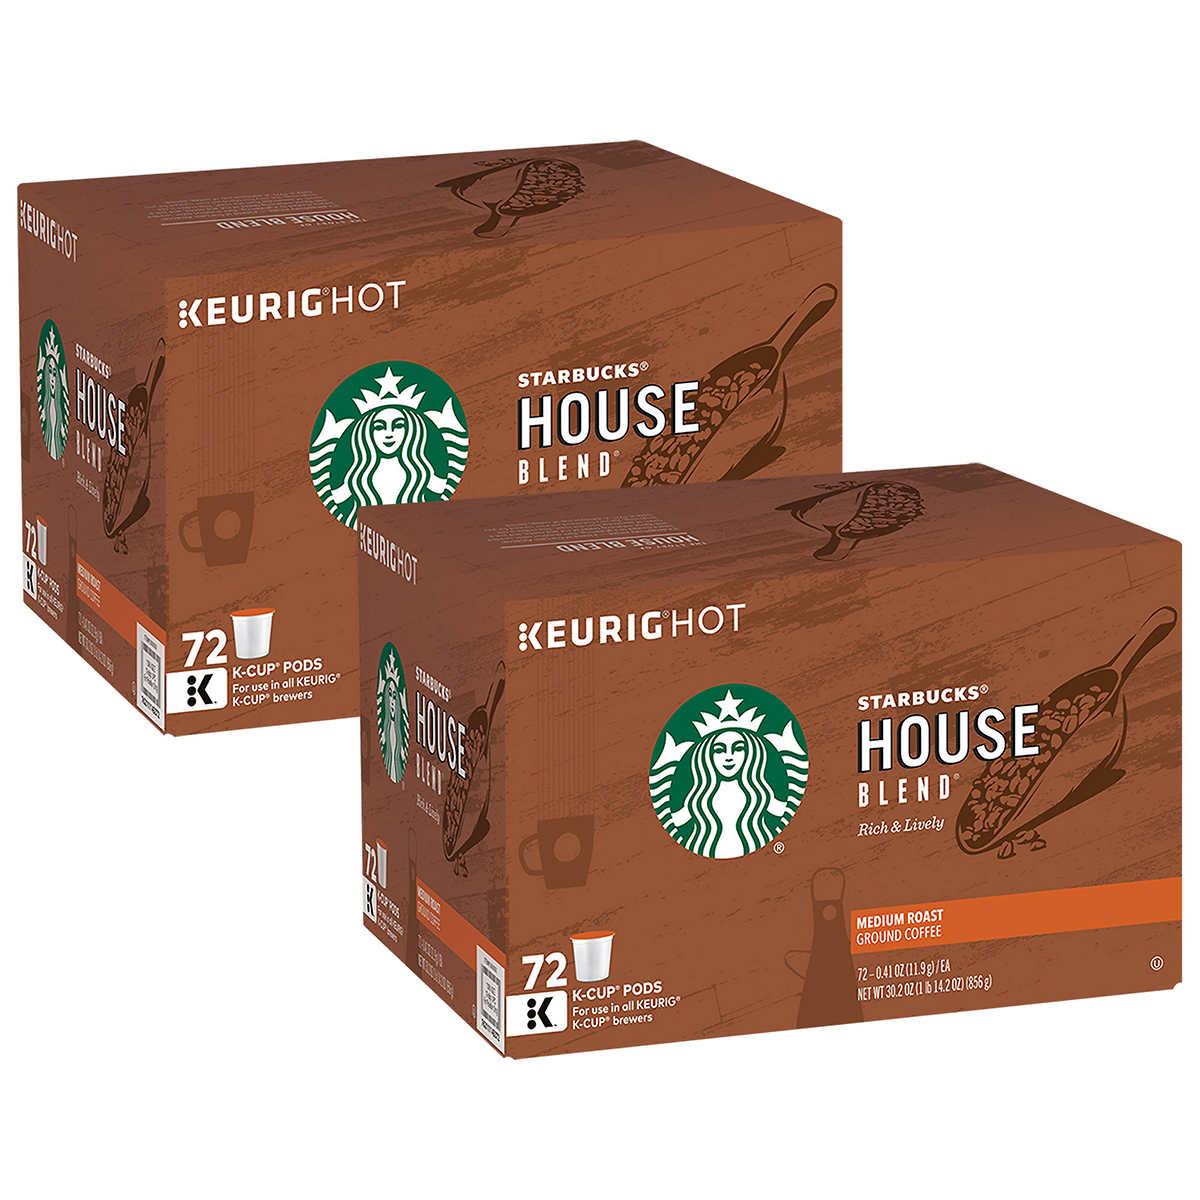 Starbucks House Blend Coffee 72 K-Cup